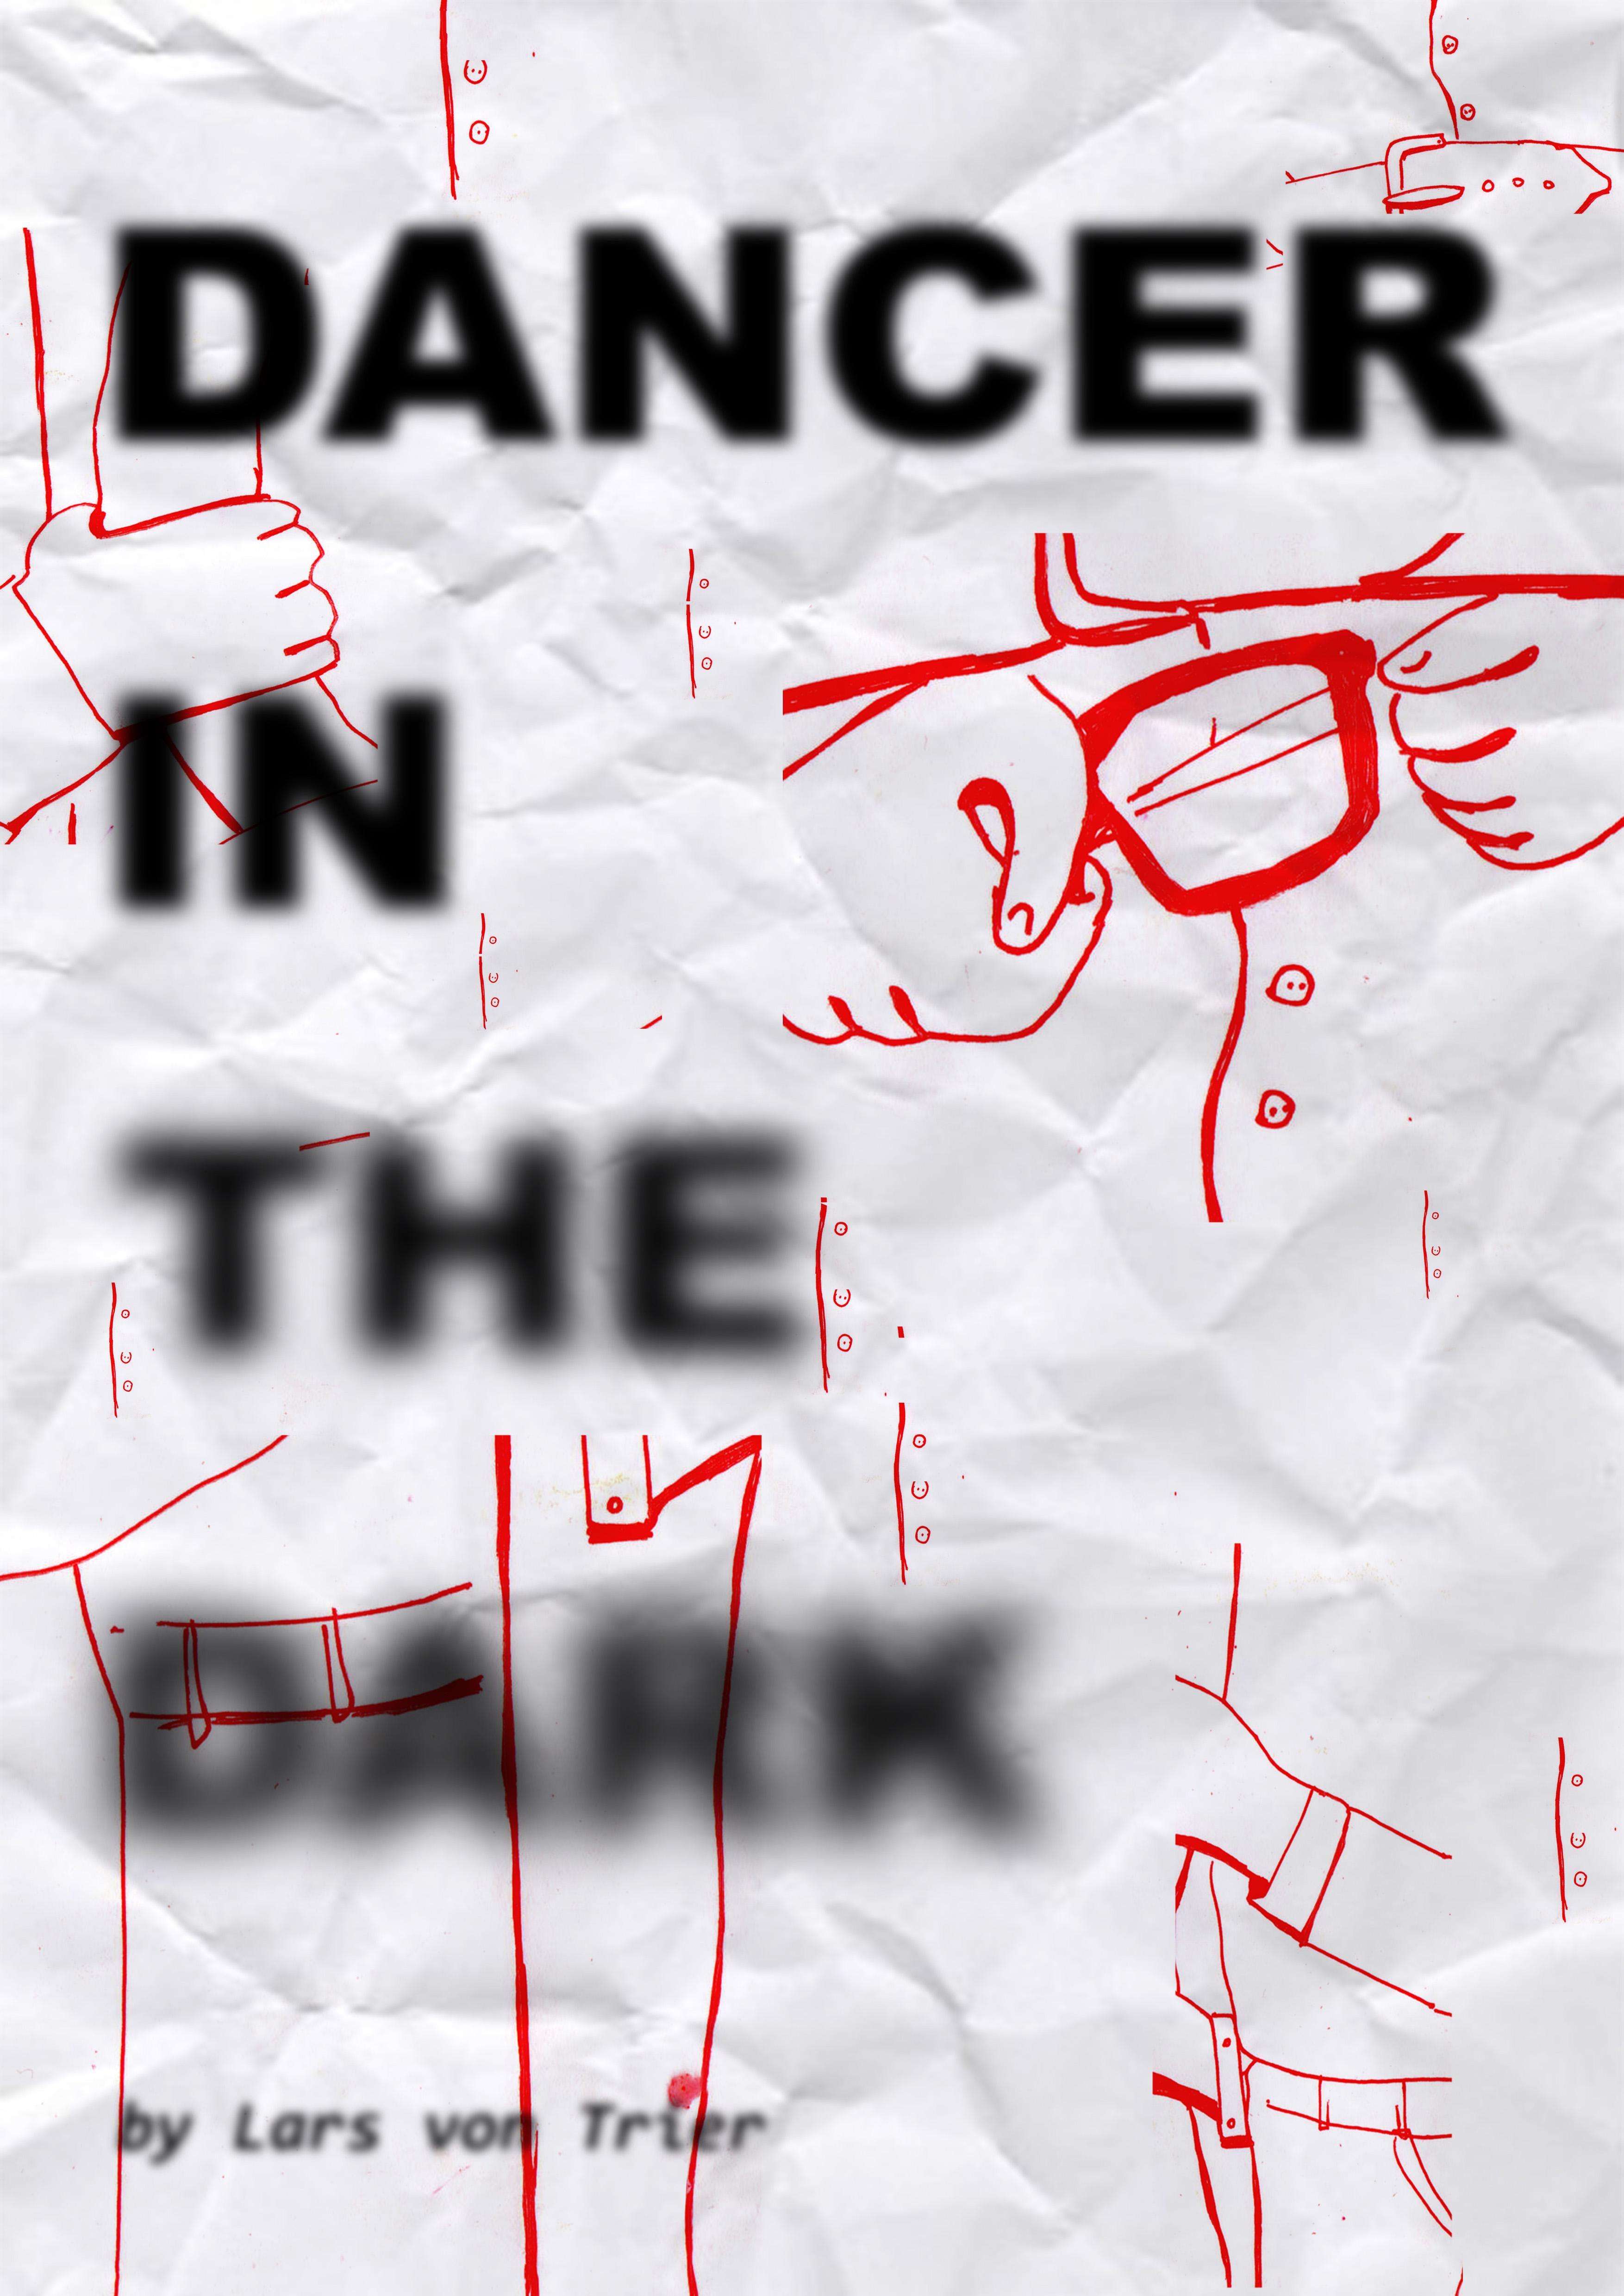 Poster To Dancer In The Dark By Lars Von Trier Skillshare Projects